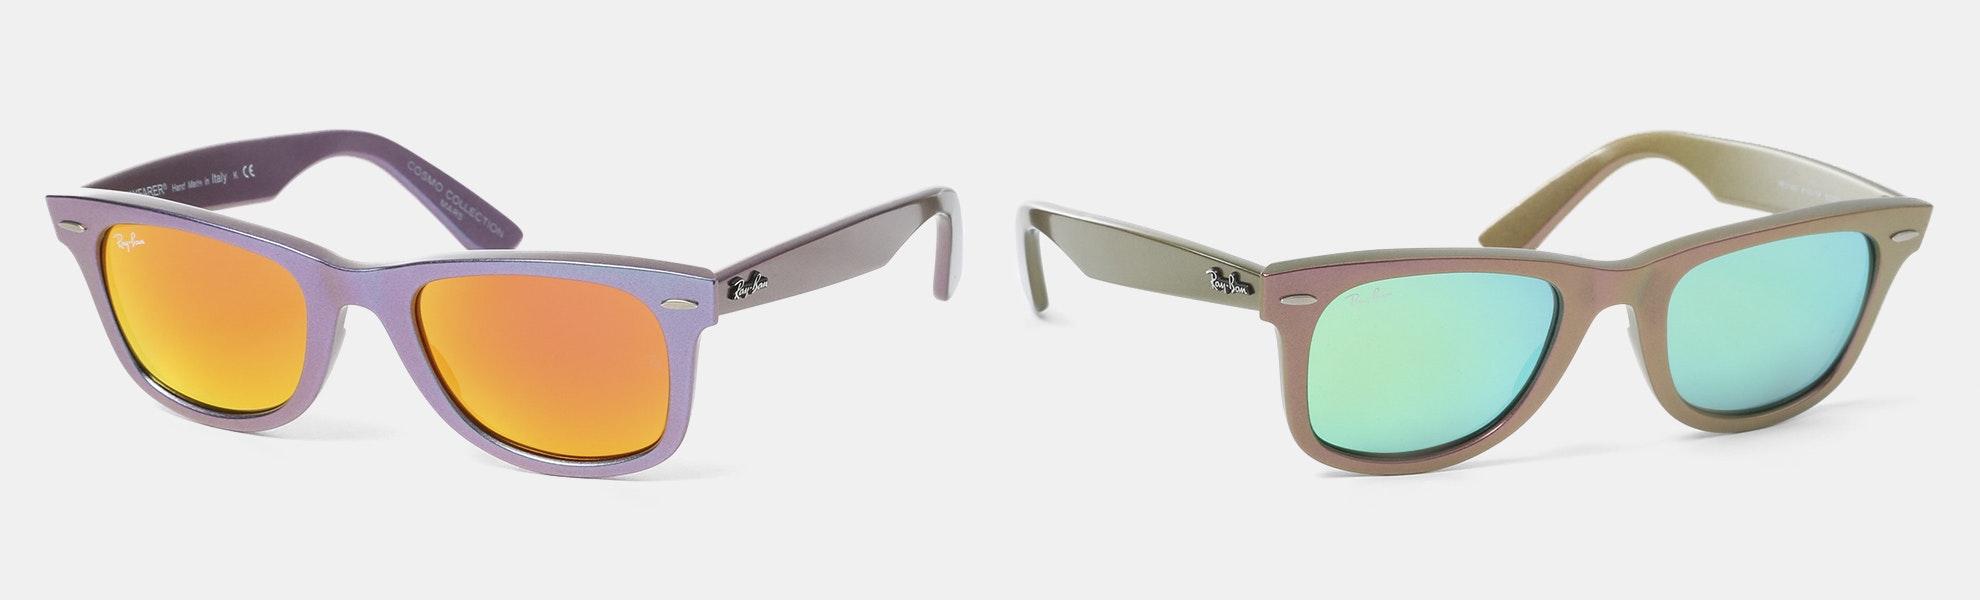 Ray-Ban Wayfarer Cosmo Sunglasses